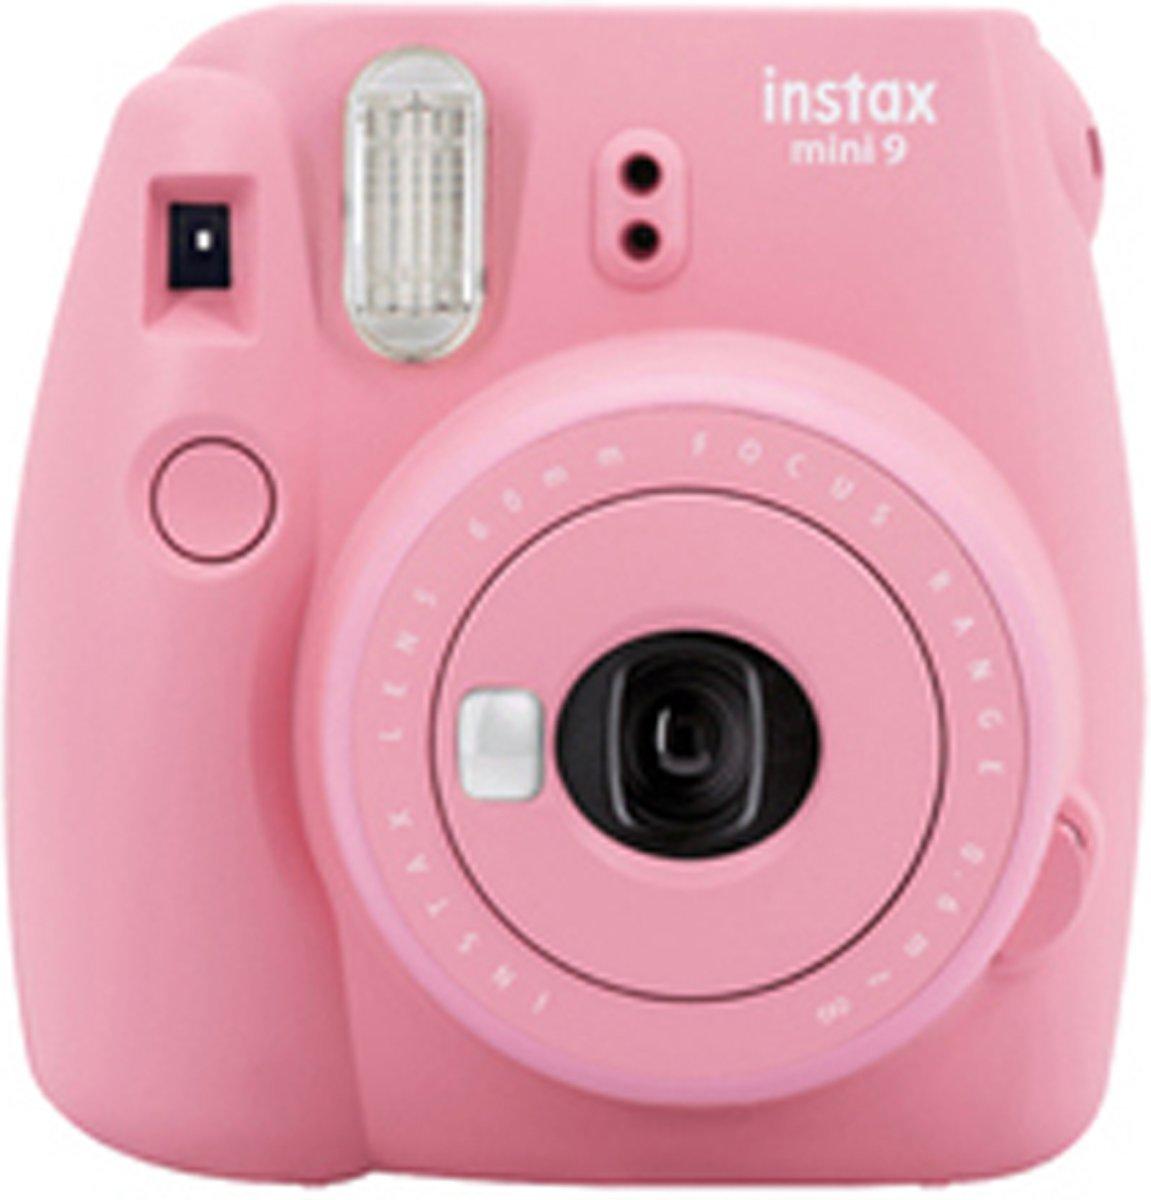 Fujifilm Instax Mini 9 - Limited Edition Polaroidcamera Blush Rose